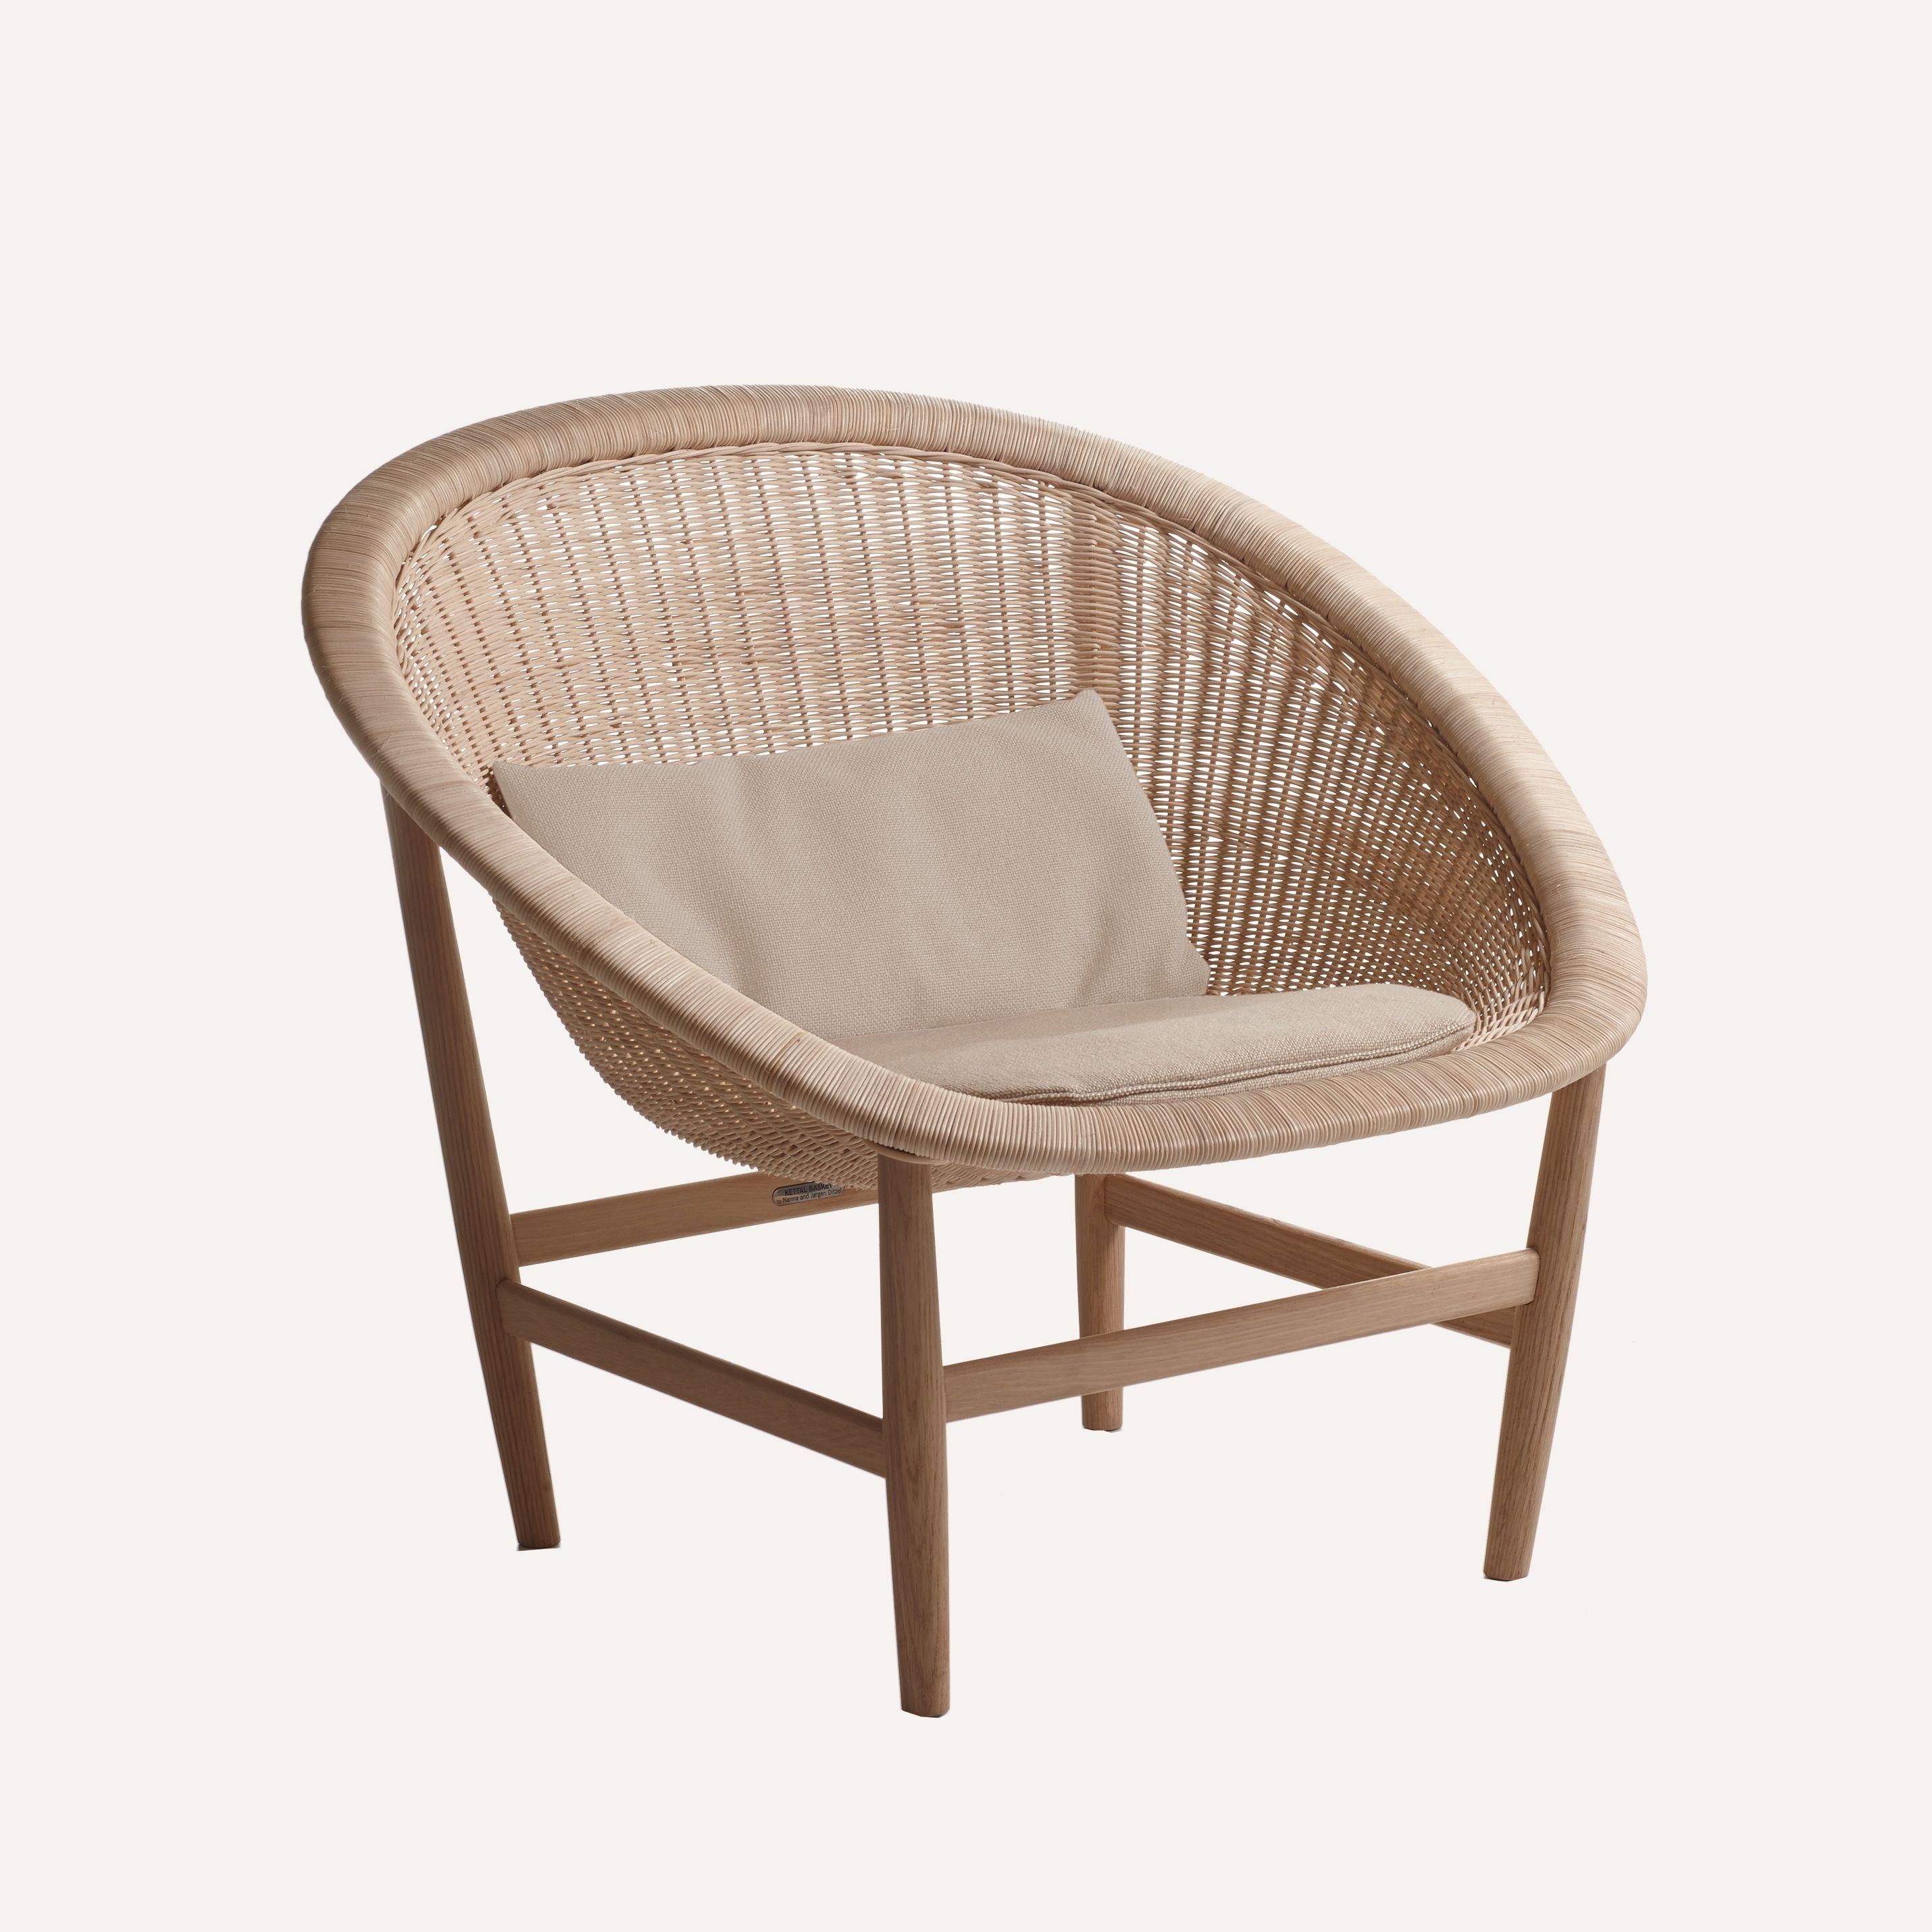 Kettal Basket Outdoor Basket armchair PAC CITY